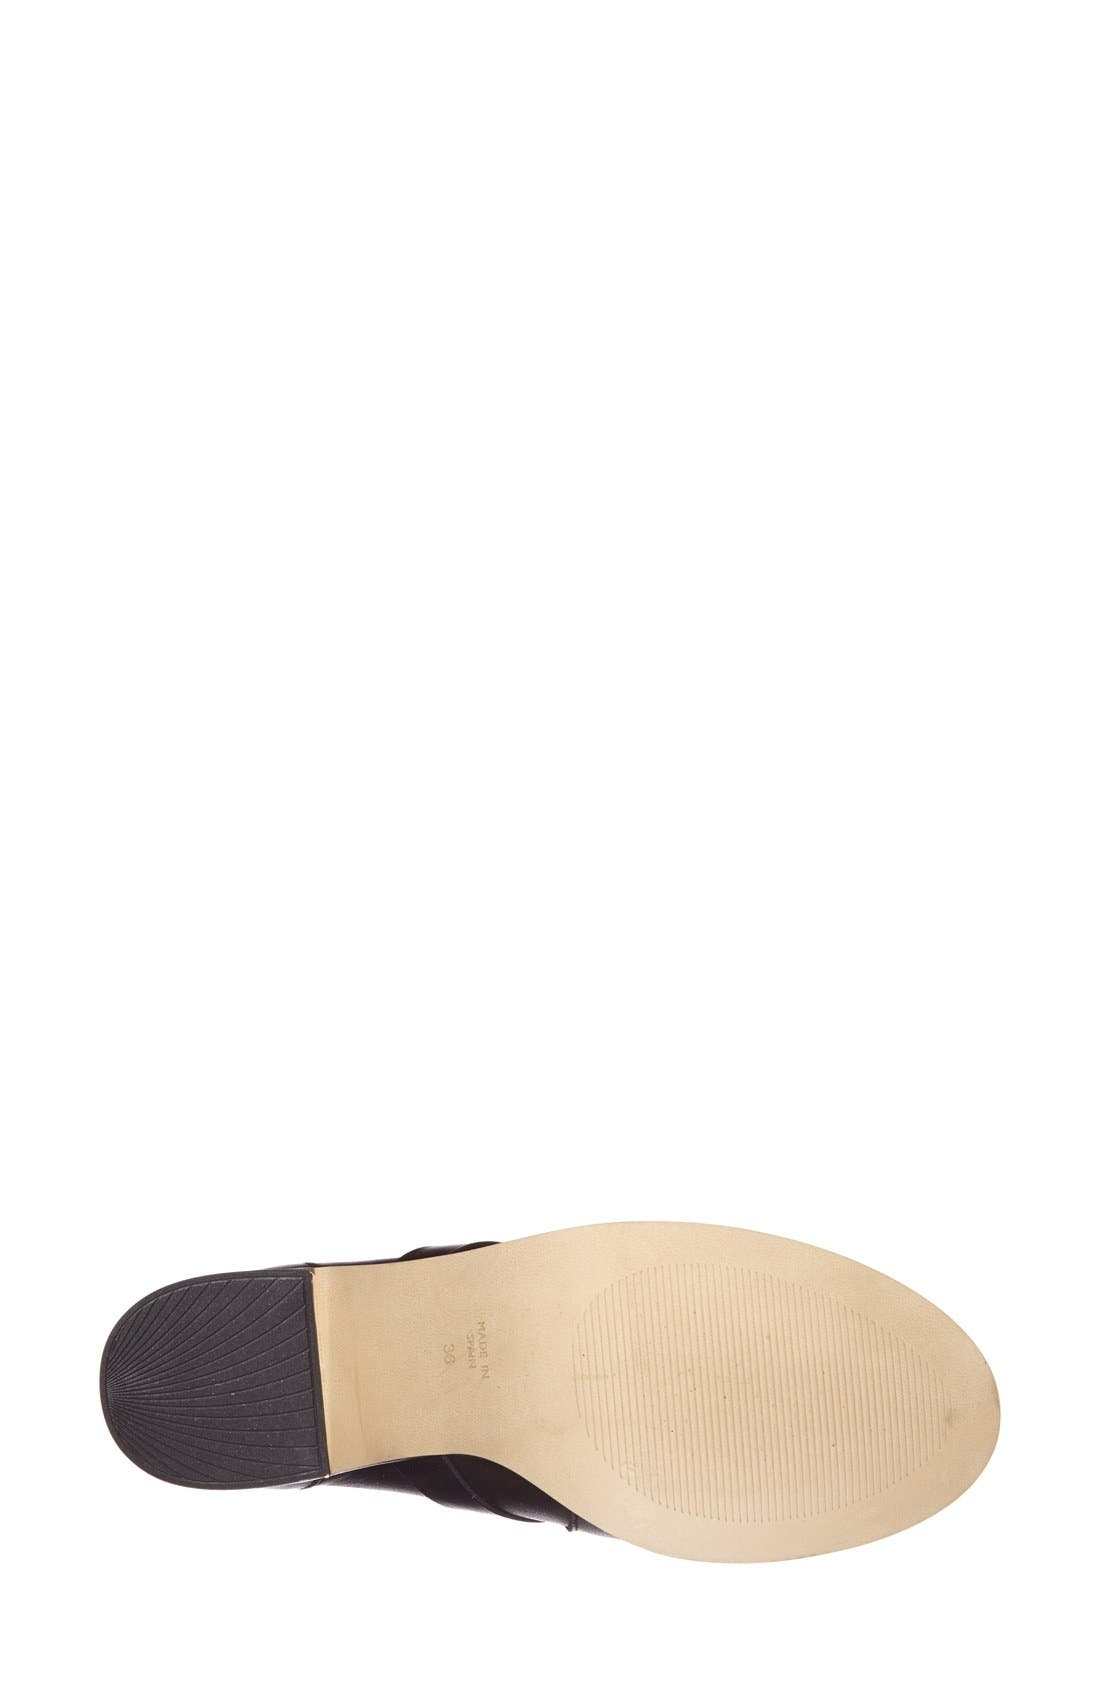 Alternate Image 4  - Topshop 'Mirror' Crisscross Strap Leather Ankle Boot (Women)